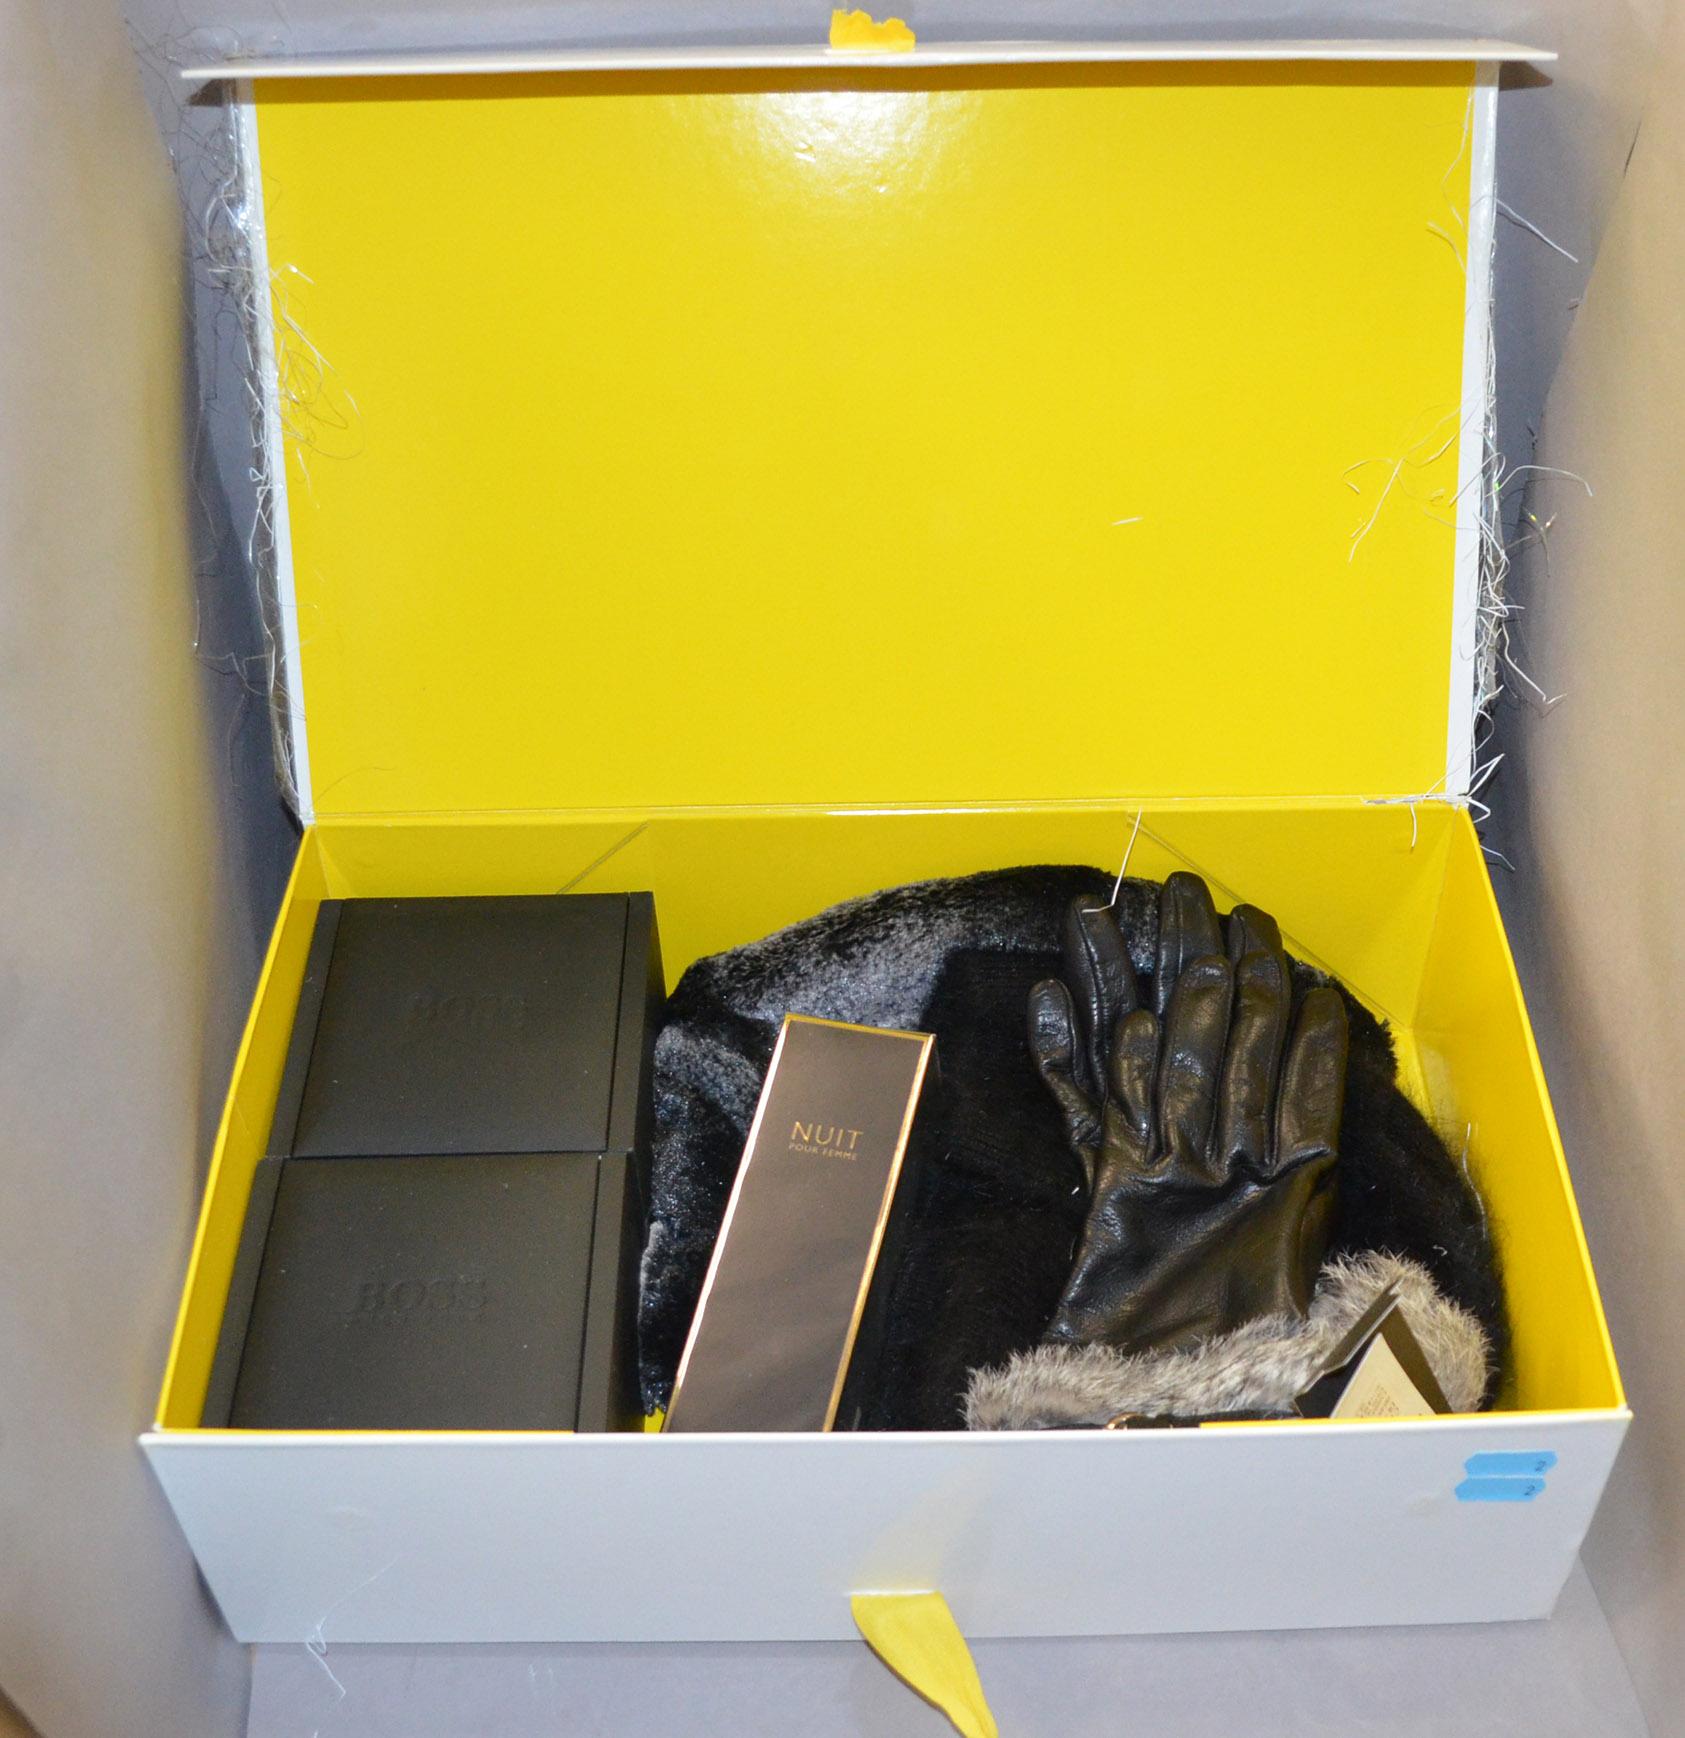 Ladies leather gloves selfridges - Lot 1037 Police Selfridges Gift Box Containing Hugo Boss Ladies Watch Hugo